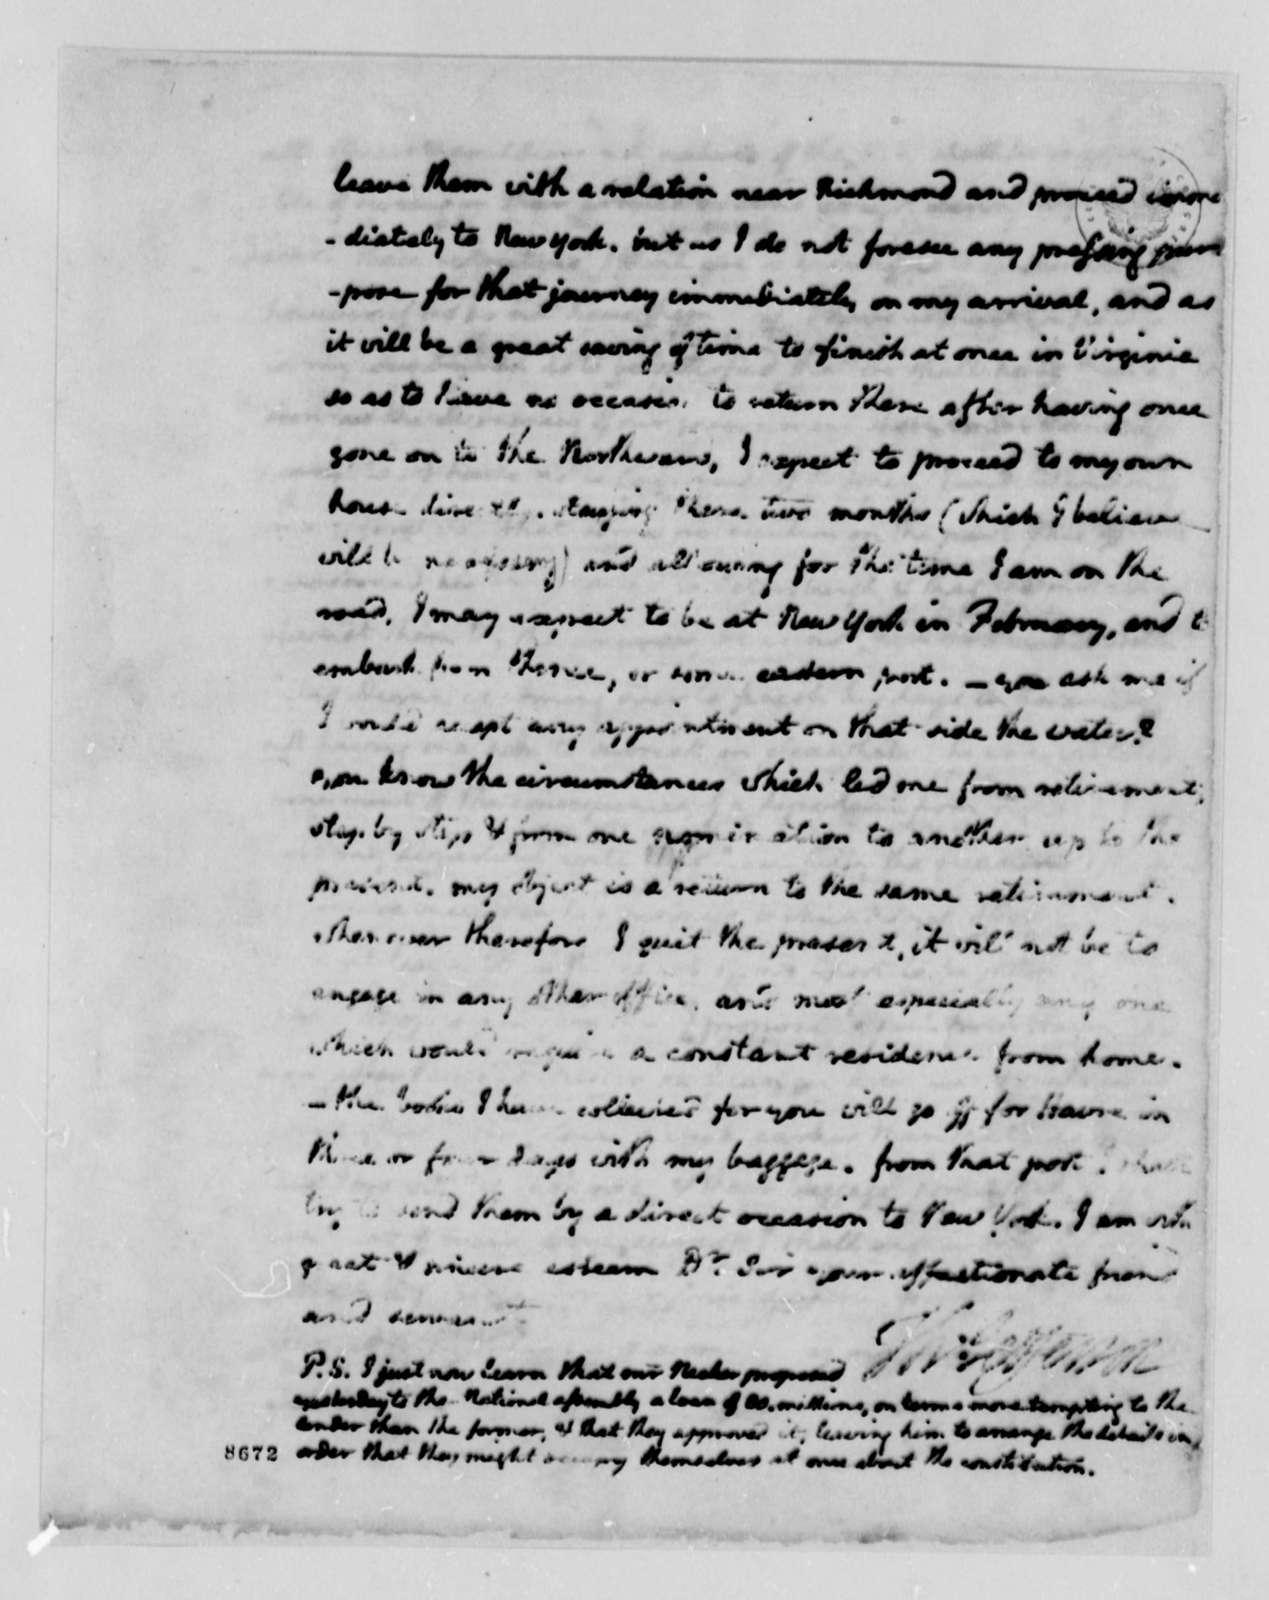 Thomas Jefferson to James Madison, August 28, 1789